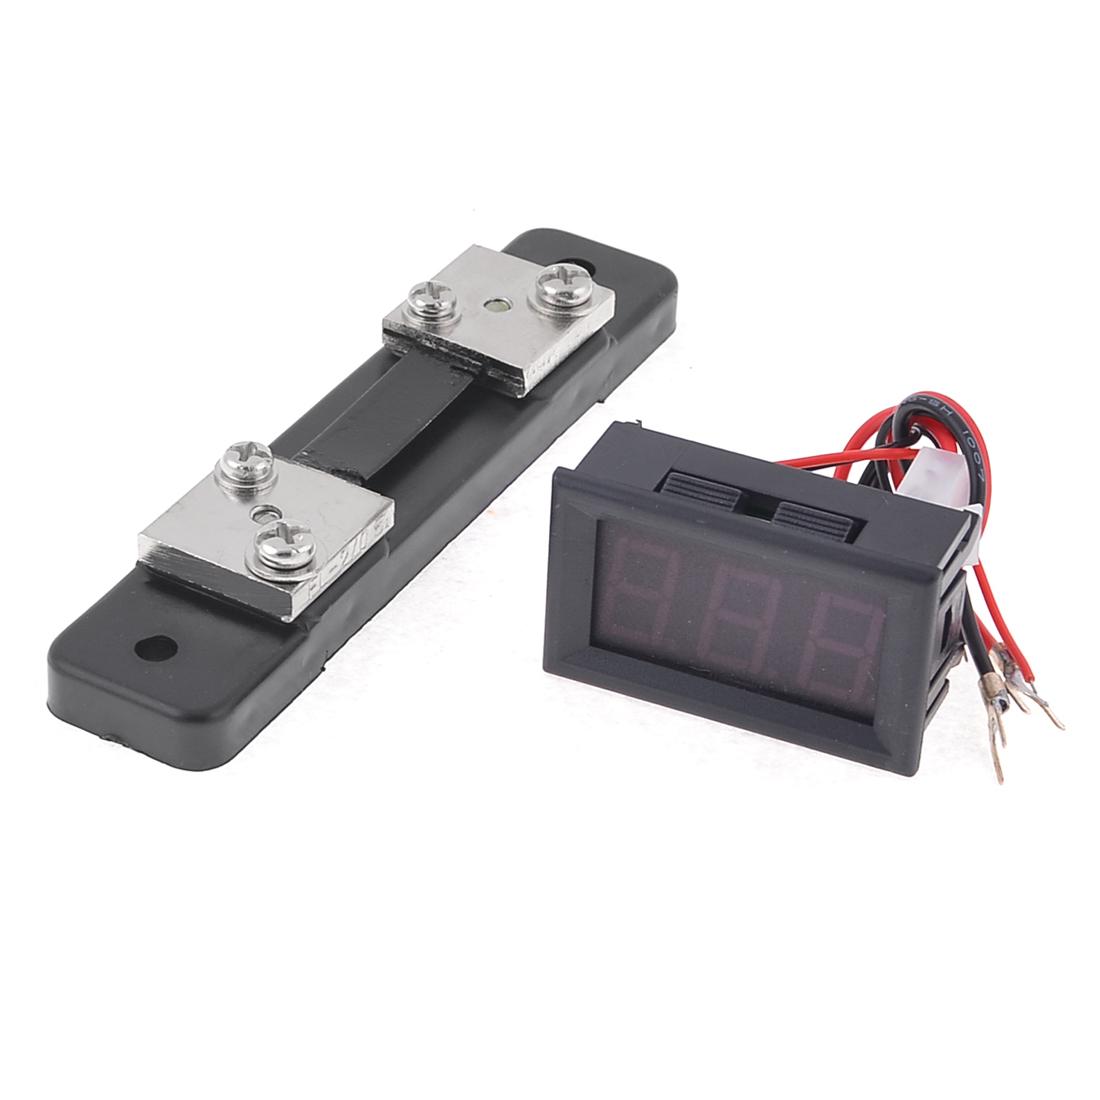 Boat Guage Current Range 0-50A Ammeter LED Digital Display w Shunt